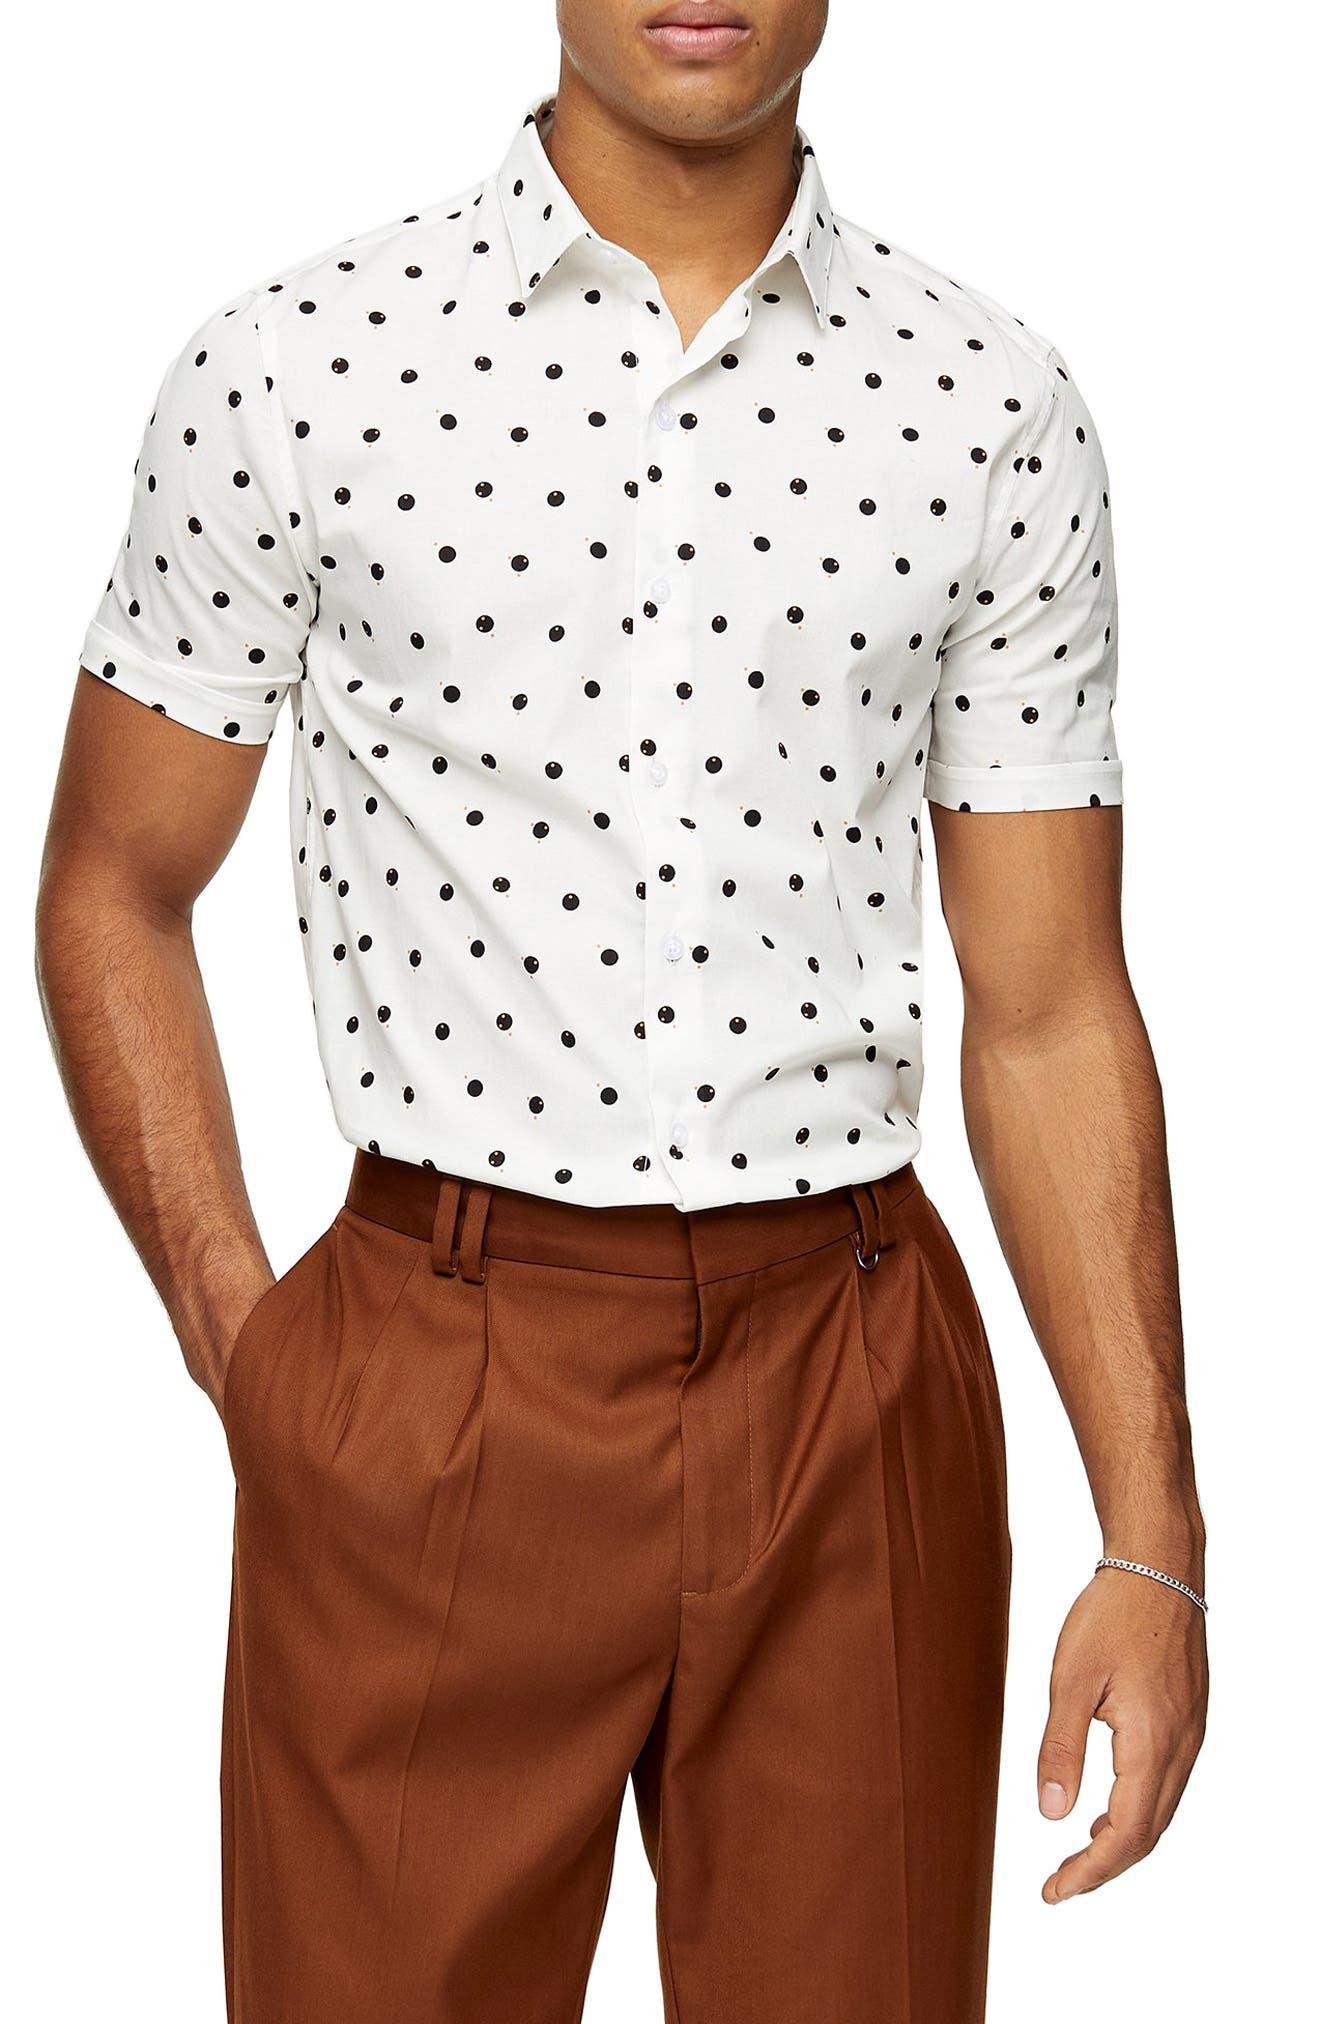 New Mens ID Short Sleeve Button Up Brown Shirt Polka Dot Red Black Front Pocket